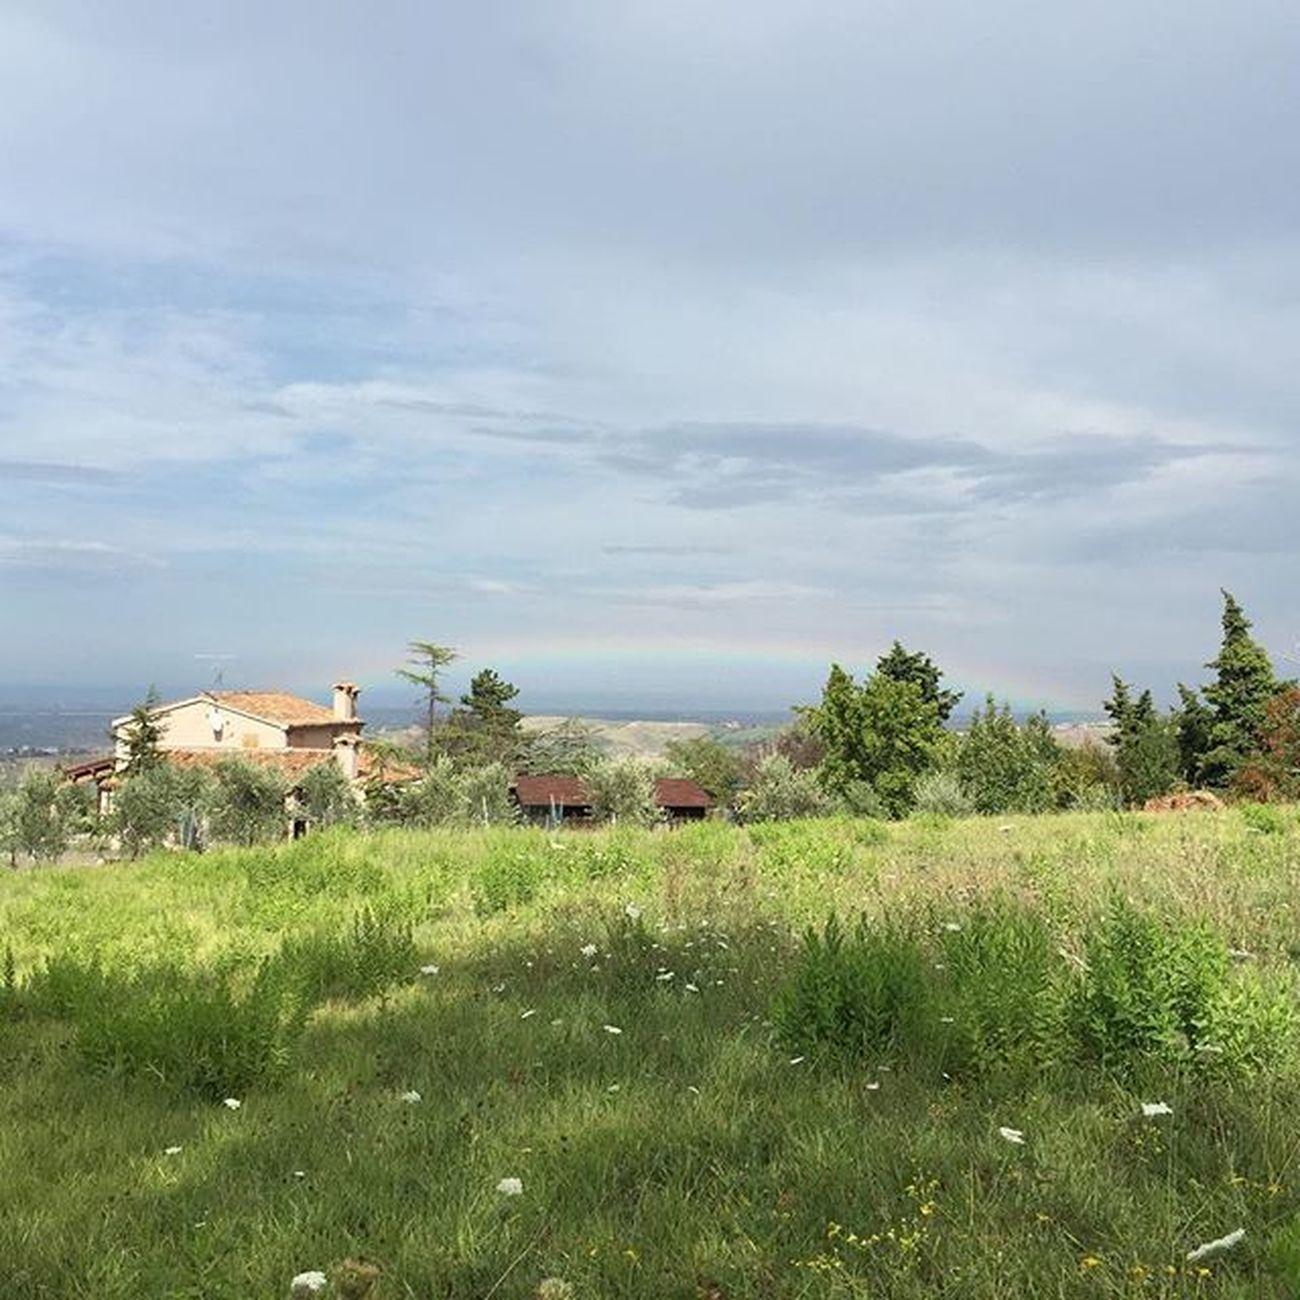 Foto da San Marino Arcobaleno  sul Mare Panorama Rimini Rainbow Picture Picoftheday Vscogood Vscdaily Vscobest Instapic Instacool Instamood Instadaily Panoramic Panoramicviews Beautiful Color Summer Holiday